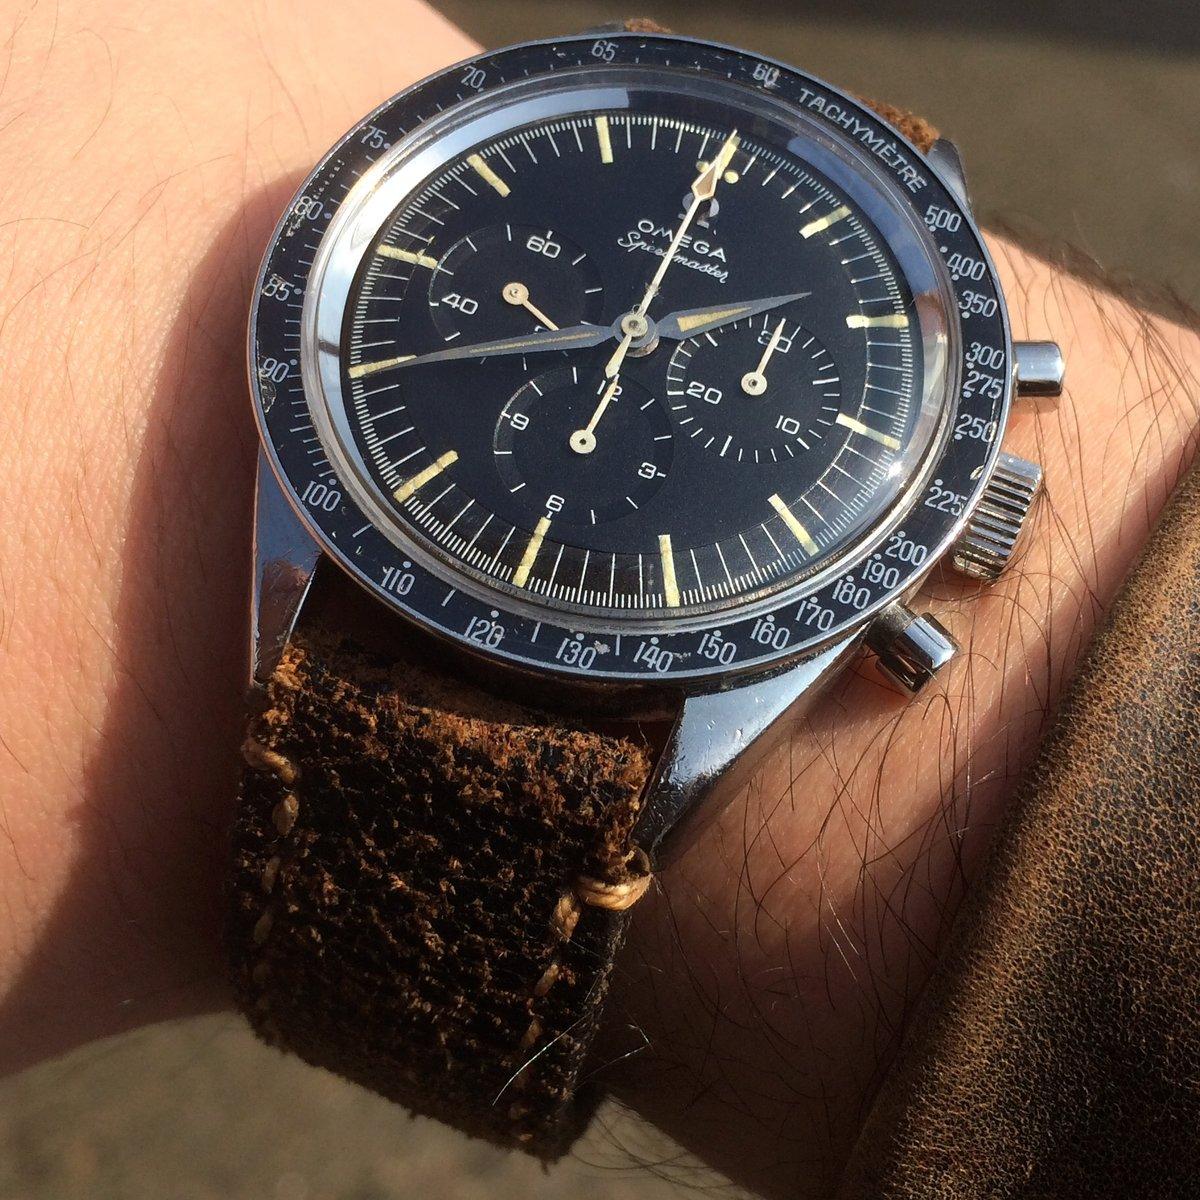 omega-speedmaster-professional-calibre-321-wristshot.jpg